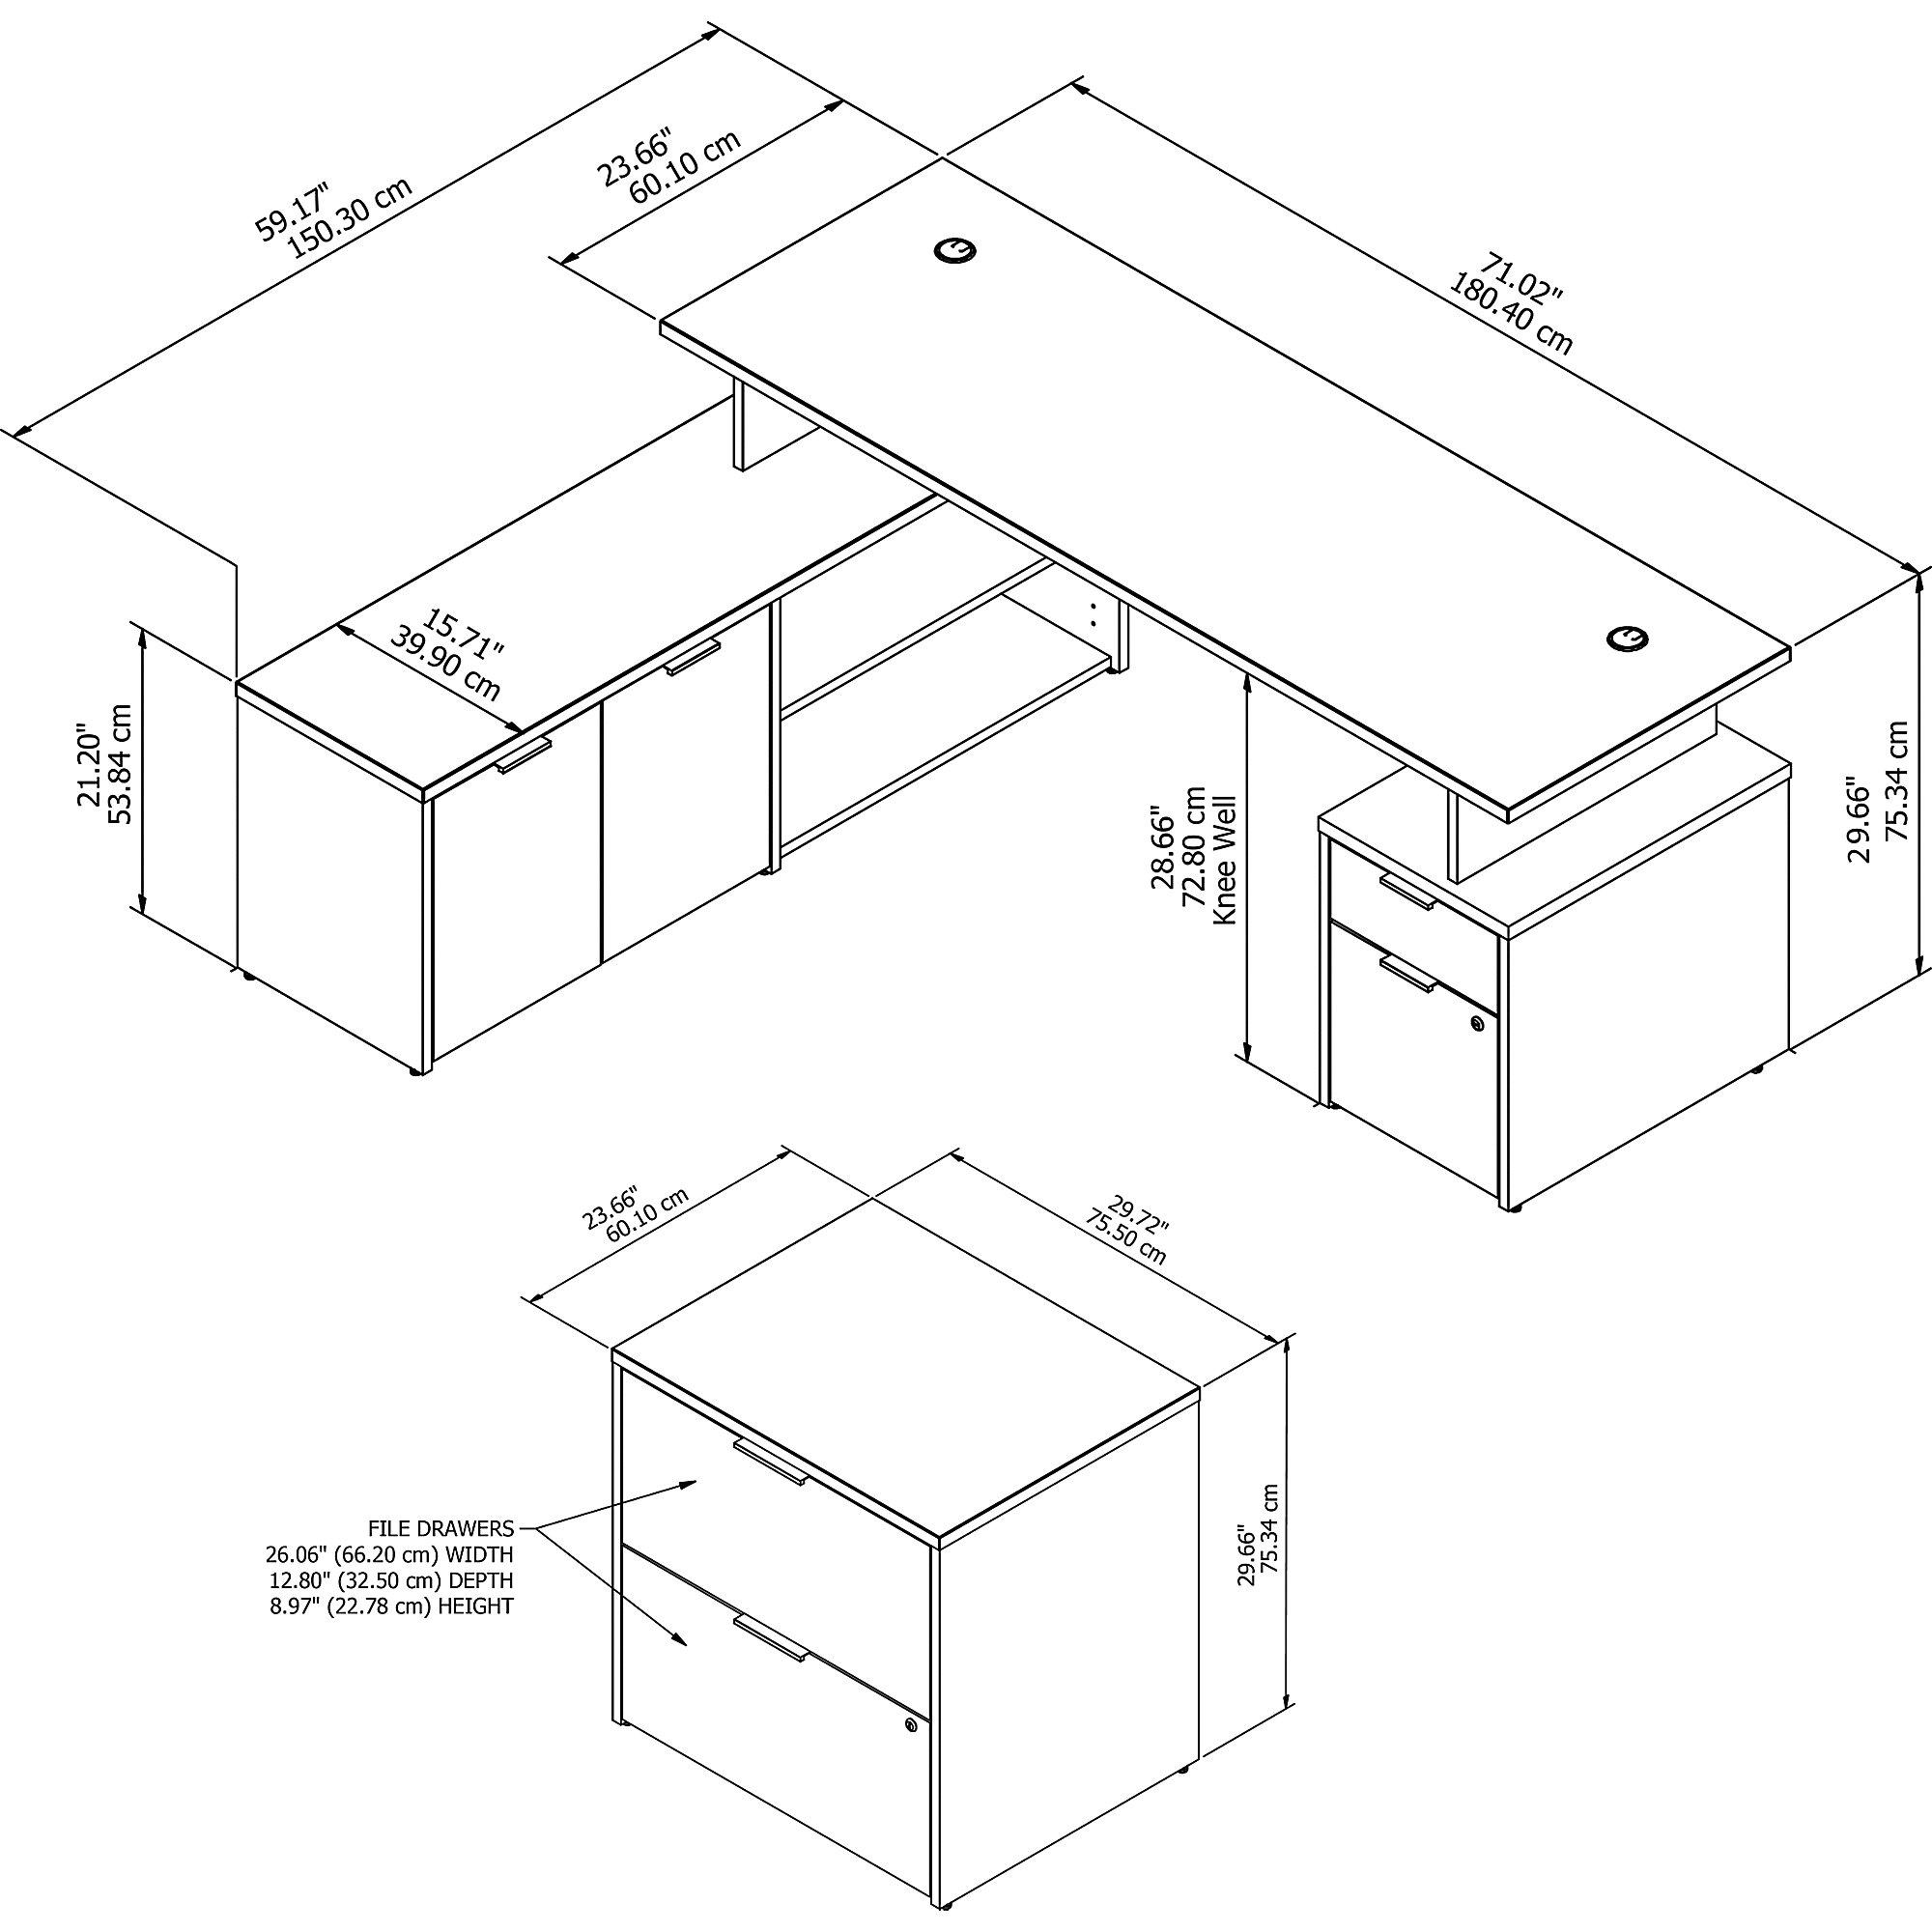 jtn010 jamestown desk dimensions